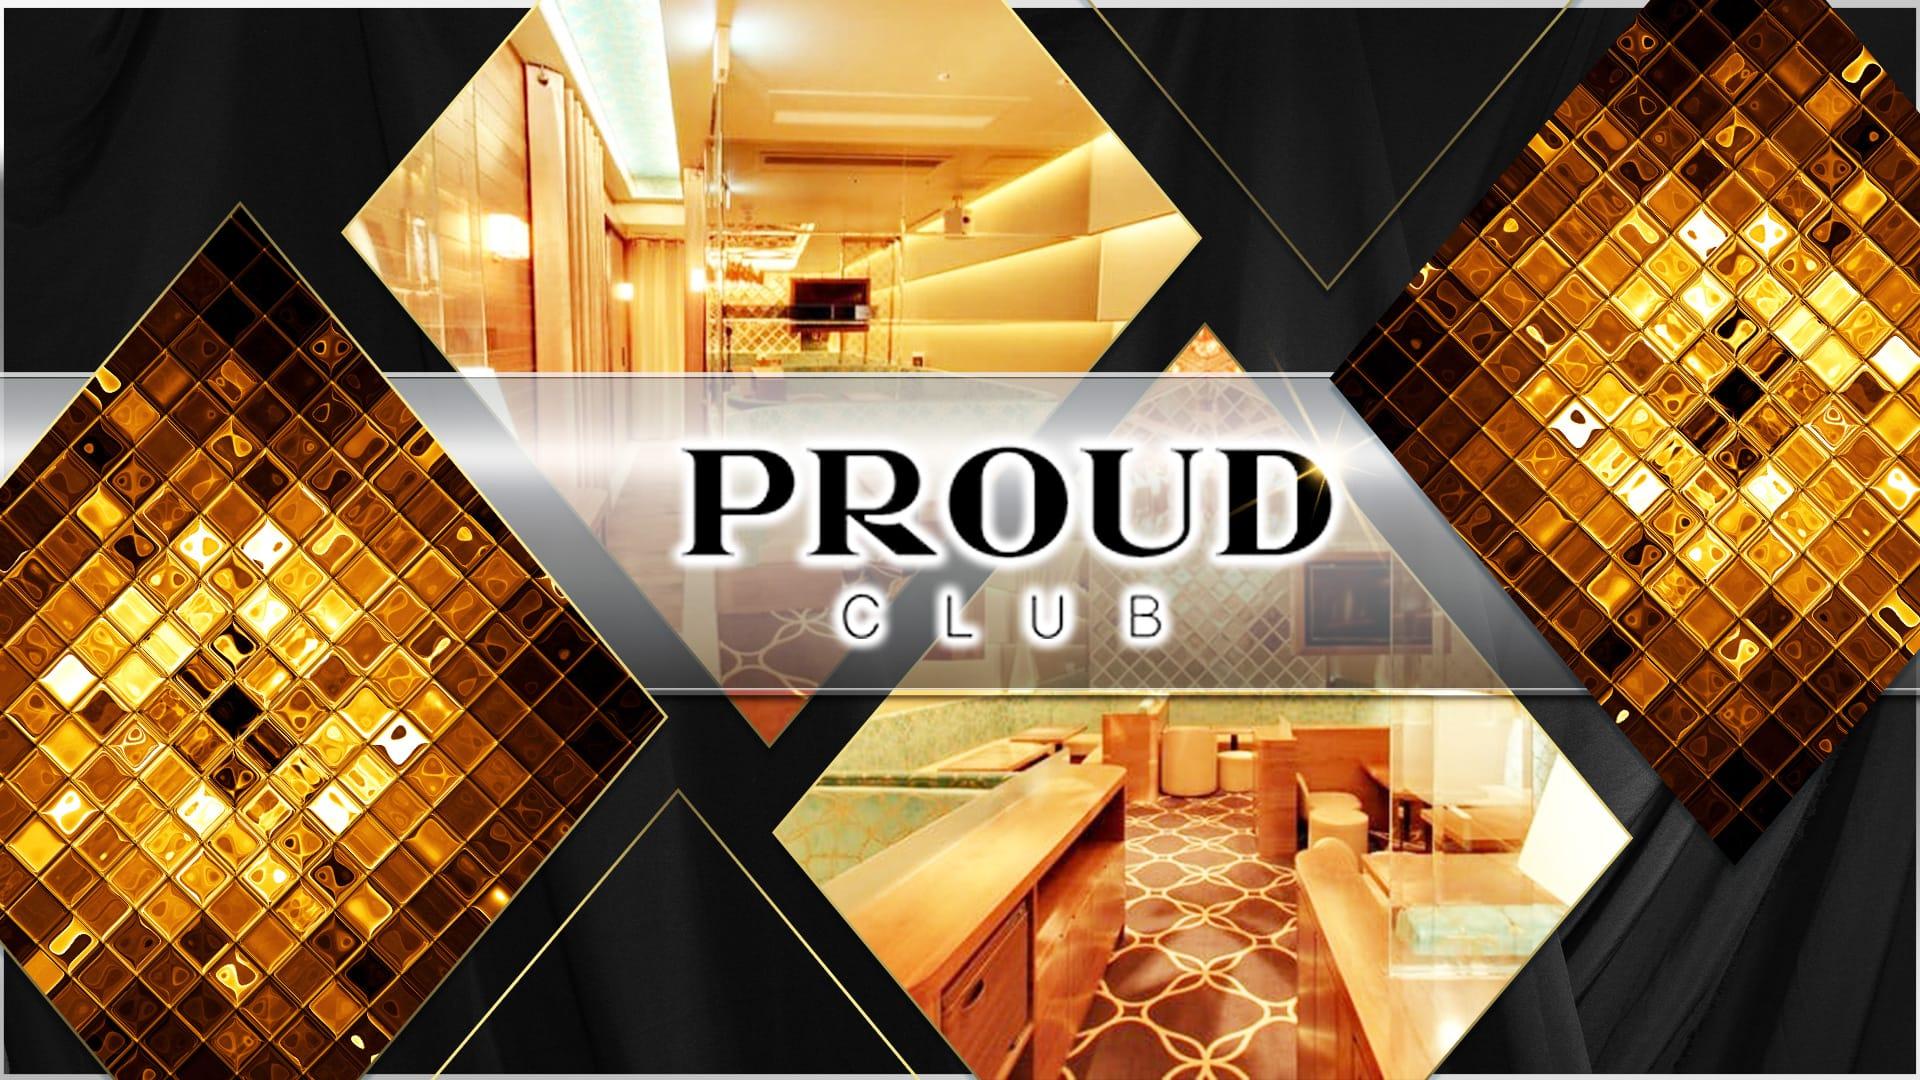 CLUB PROUD~クラブ プラウド~ 大宮キャバクラ TOP画像